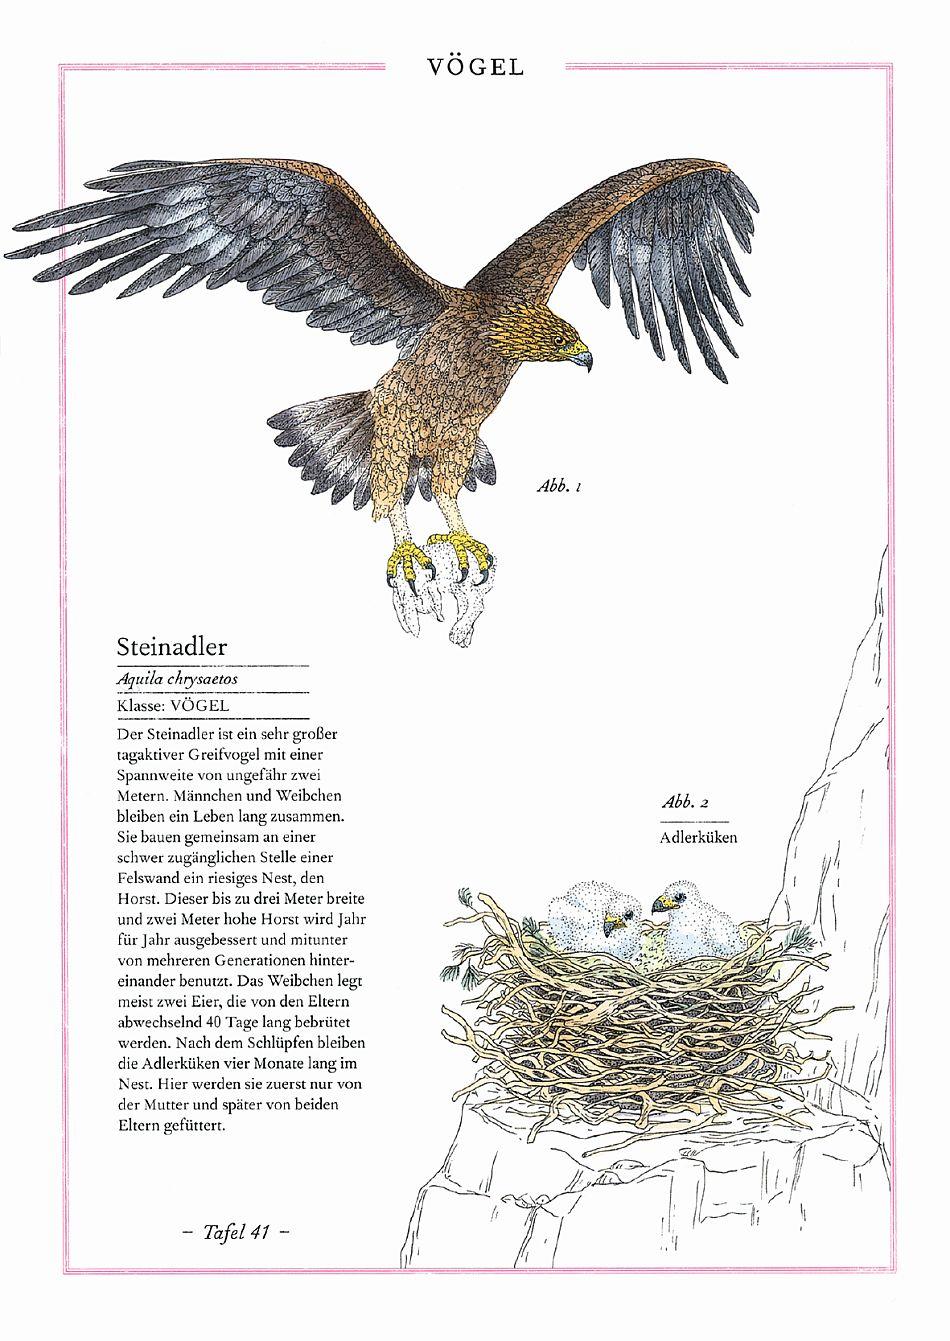 Steinbock, Adler, Edelweiß -Die Welt der Berge